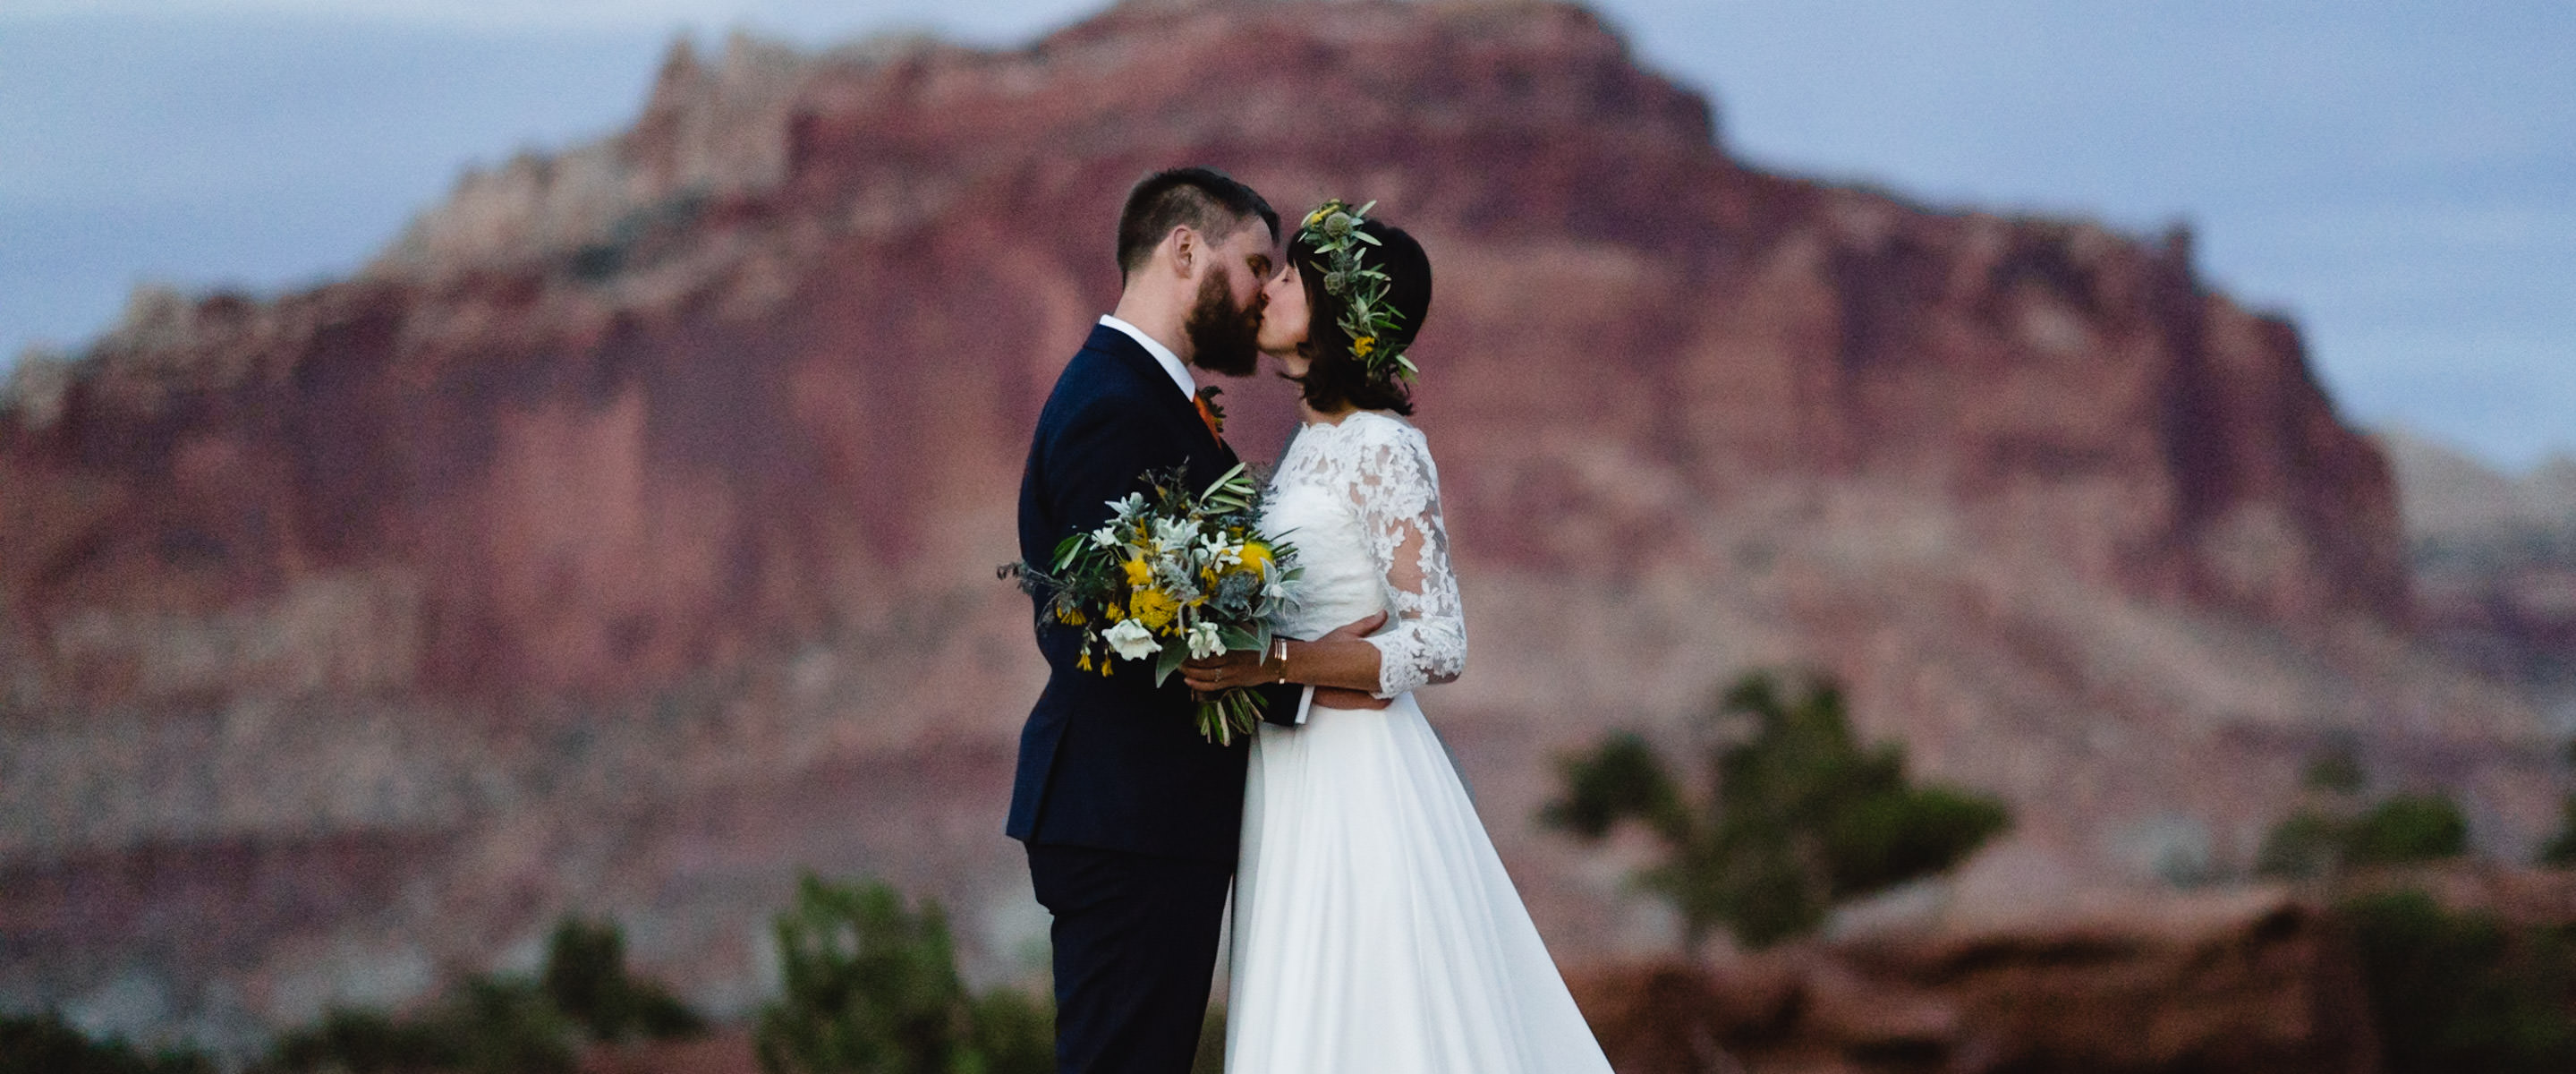 Capitol Reef National Park Wedding photo